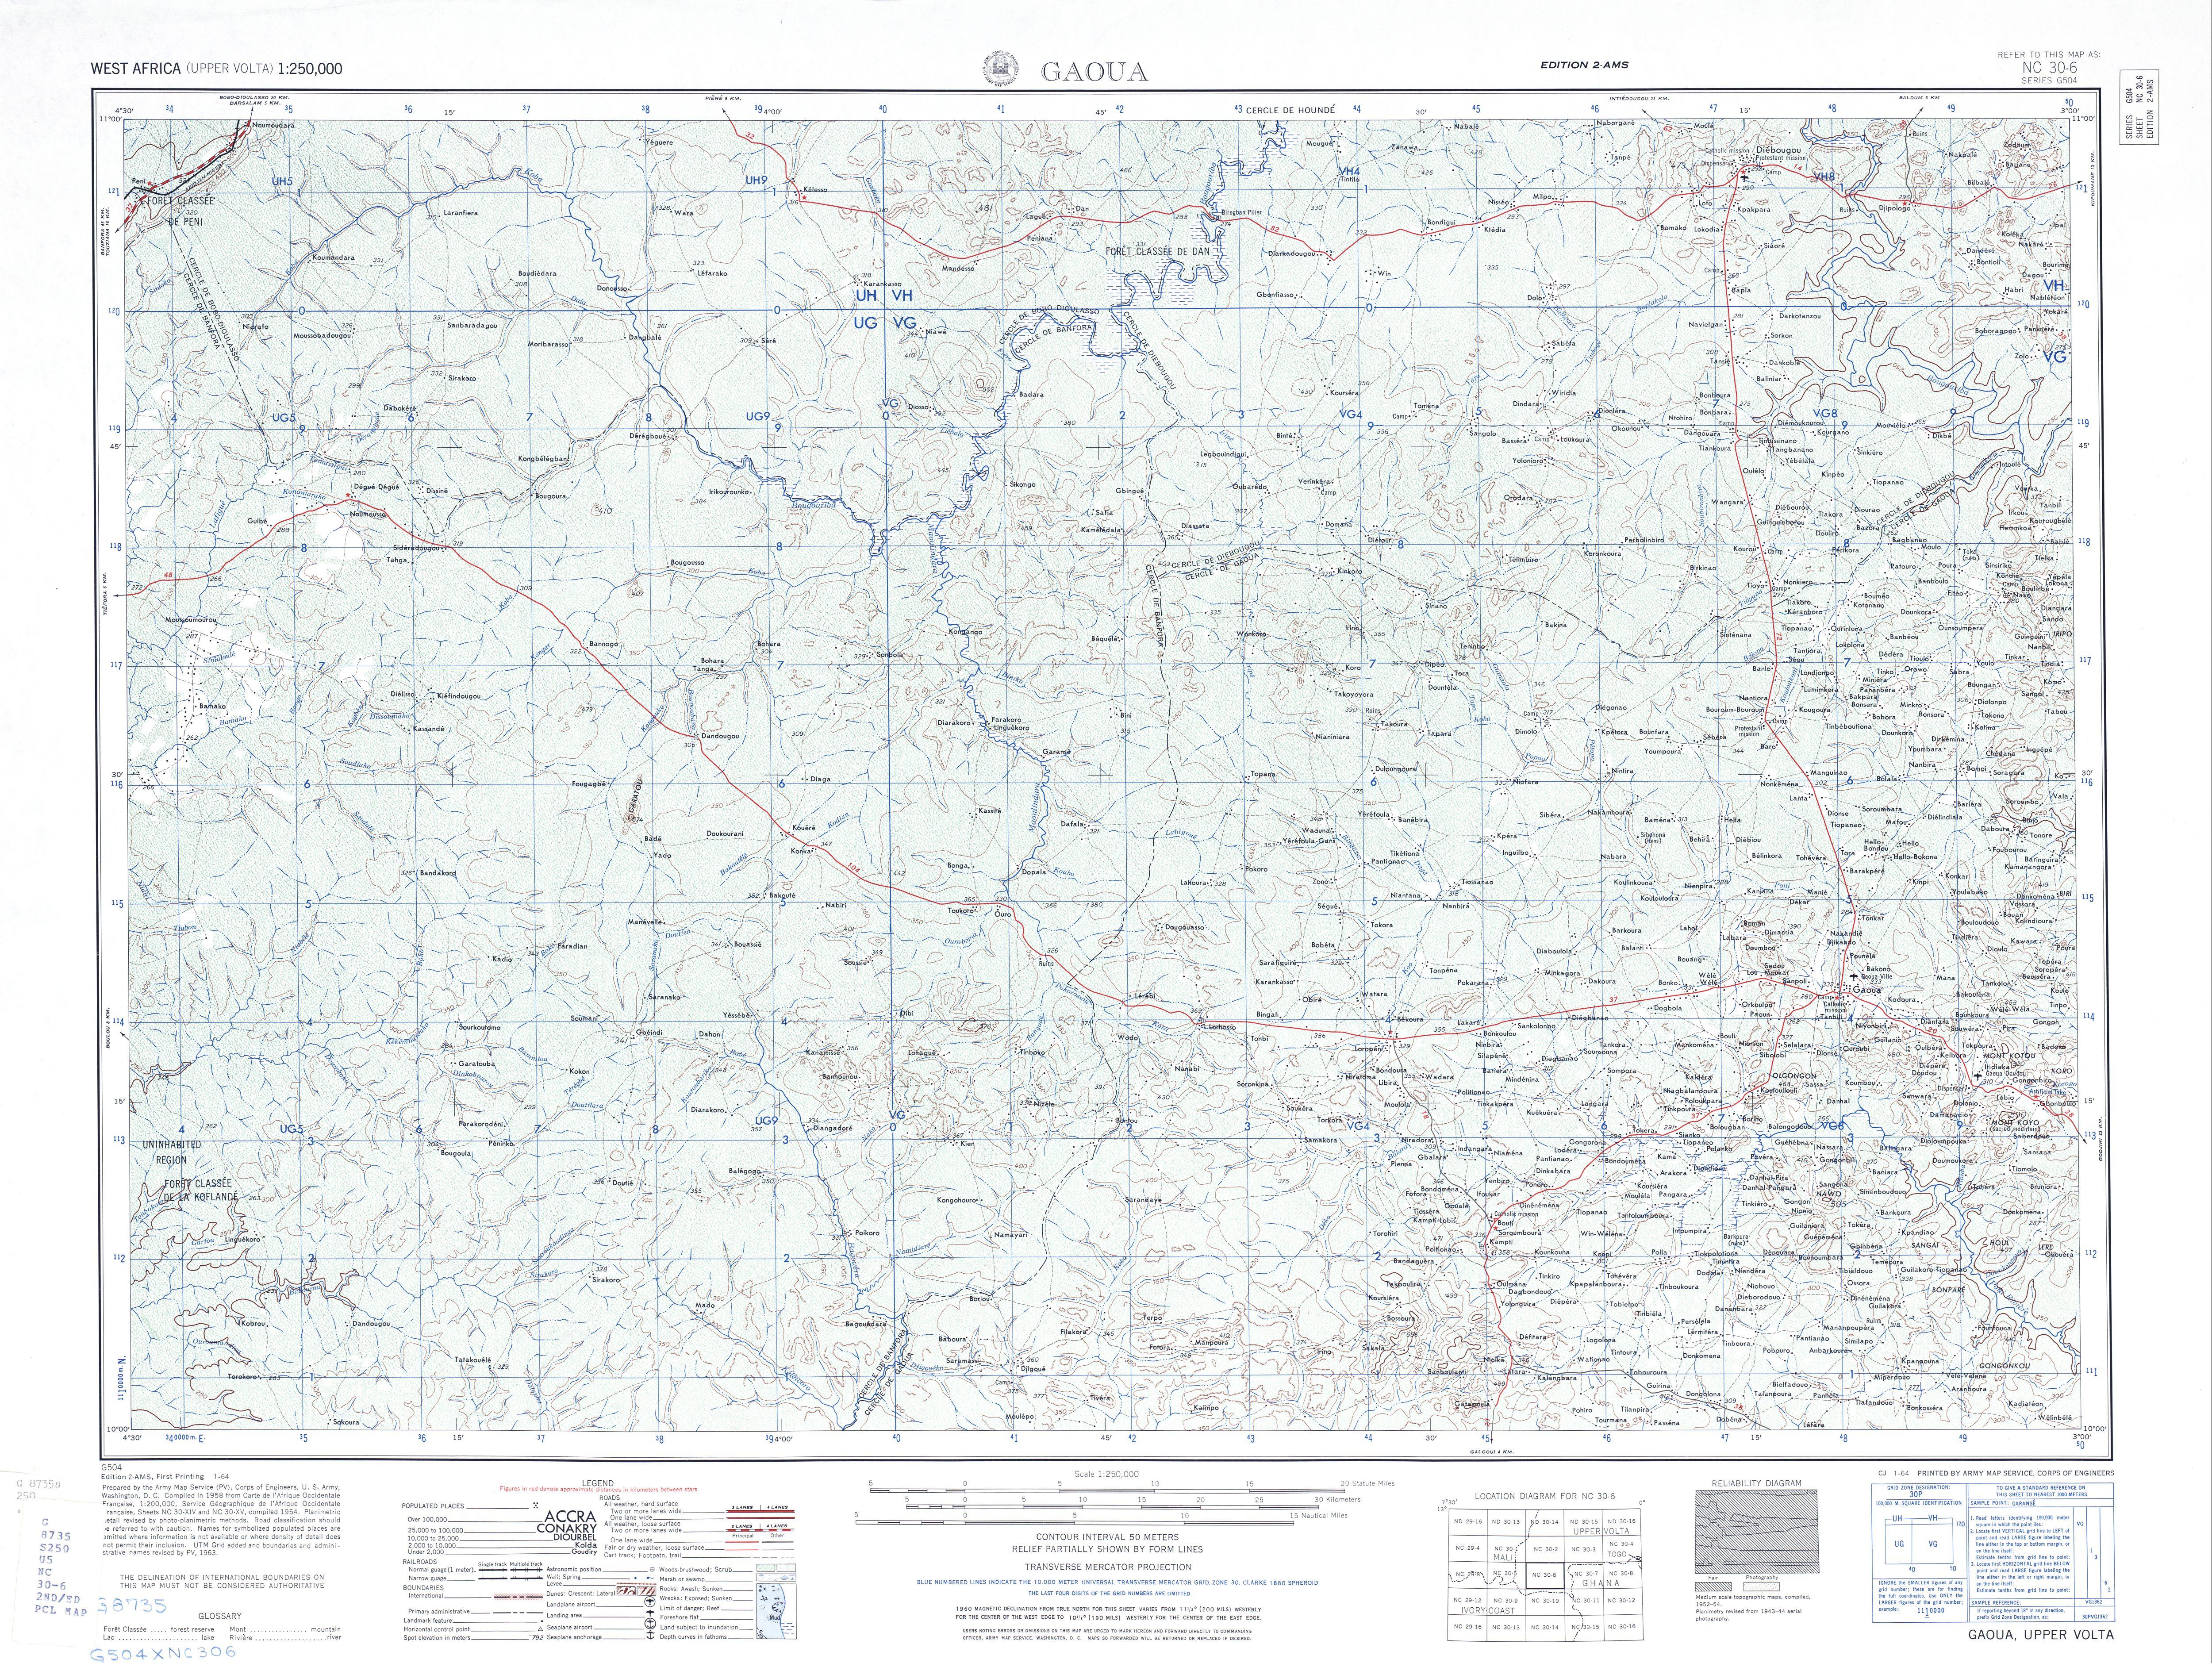 Gaoua Topographic Map Sheet, Western Africa 1955